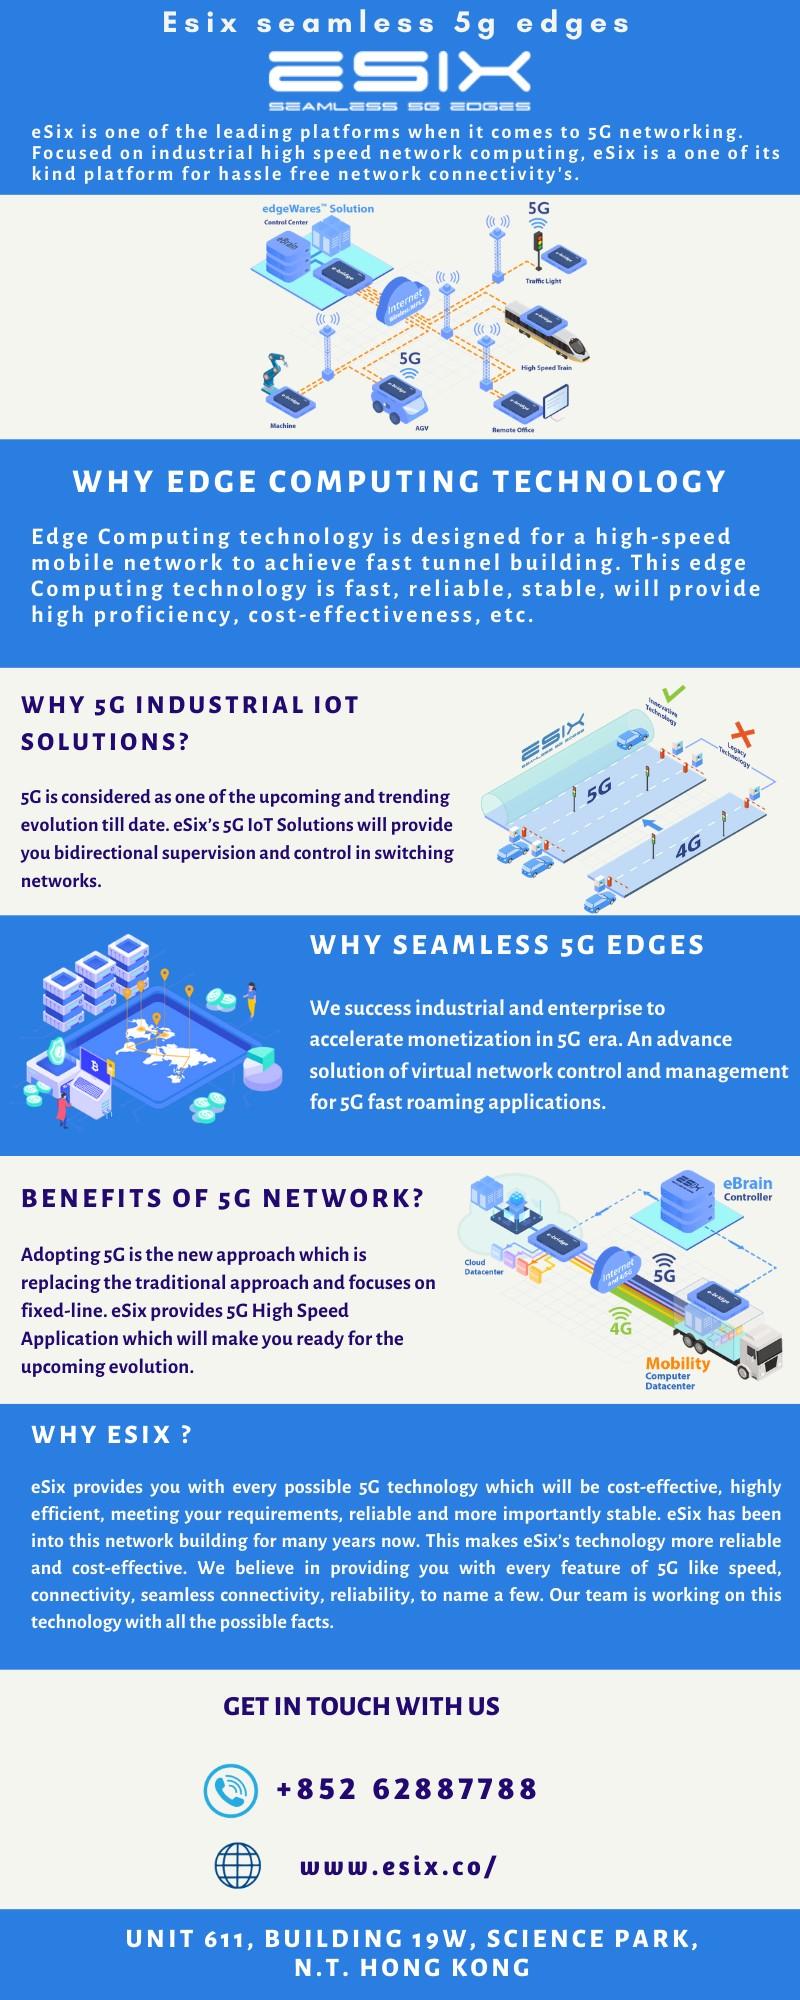 Edge Computing Technology - 5G High Speed Applications